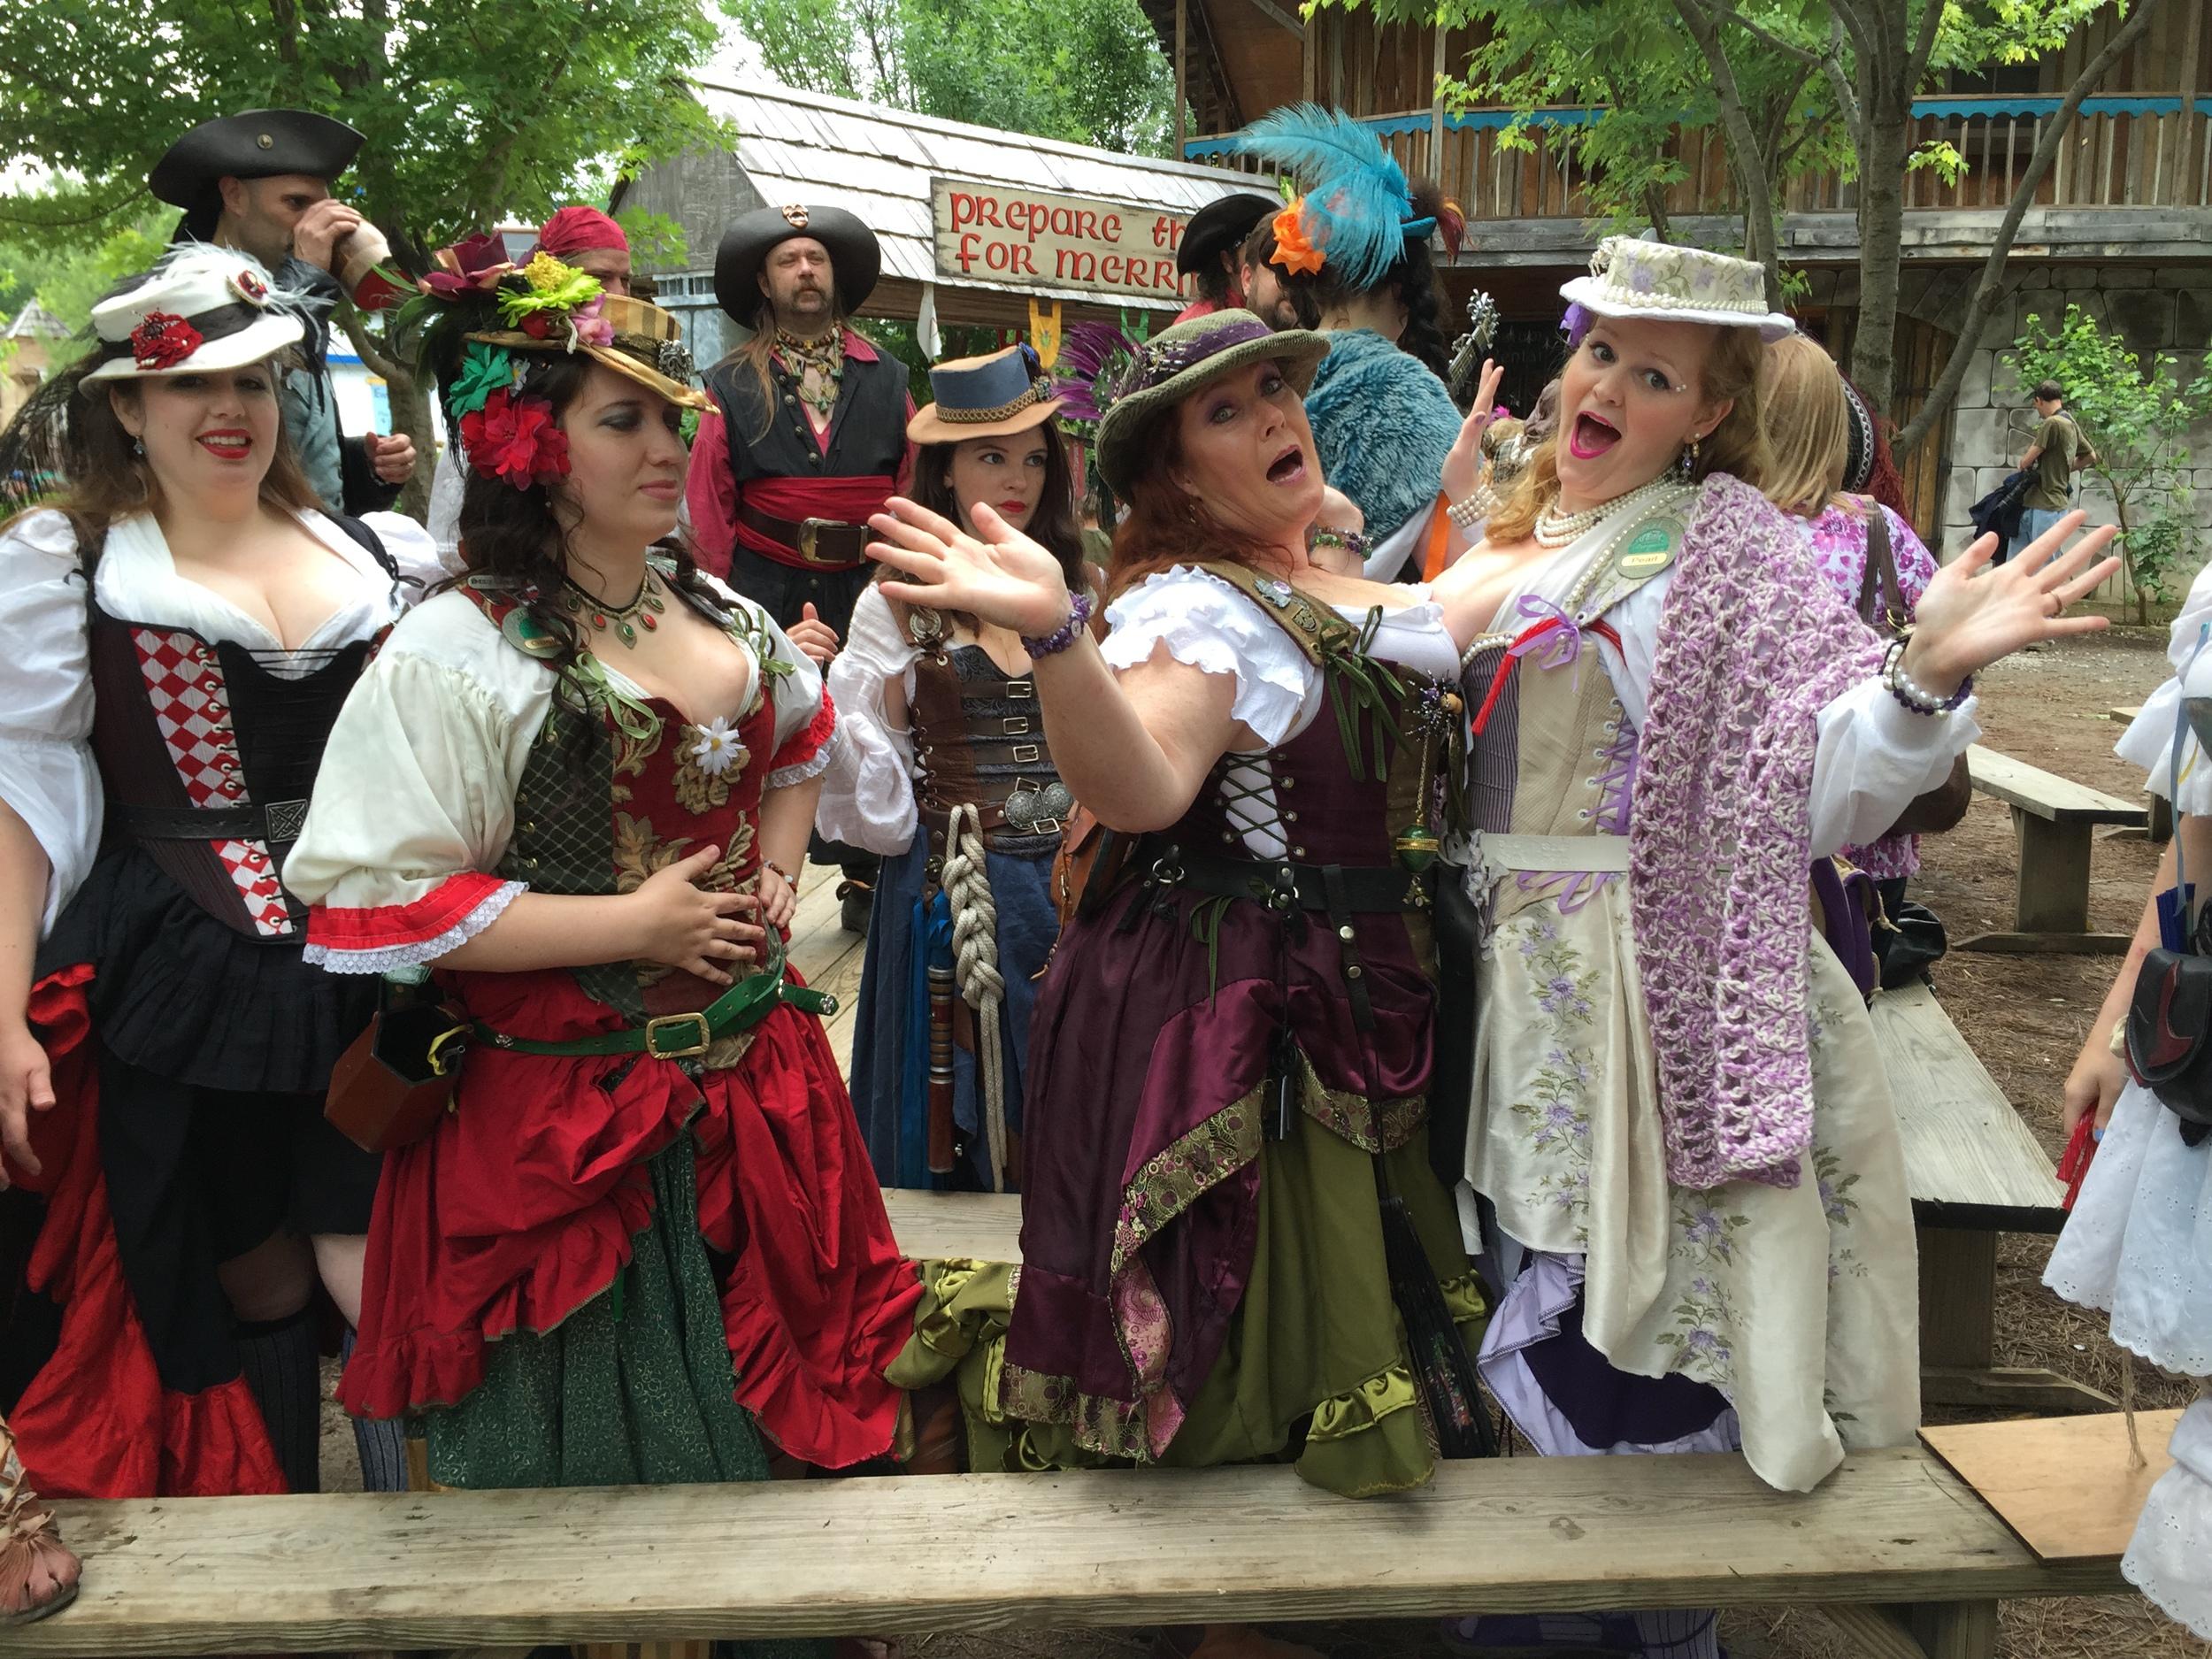 (Ladies of Castleton -- PHOTO COPYRIGHT 2015 BY JAZ PRIMO)